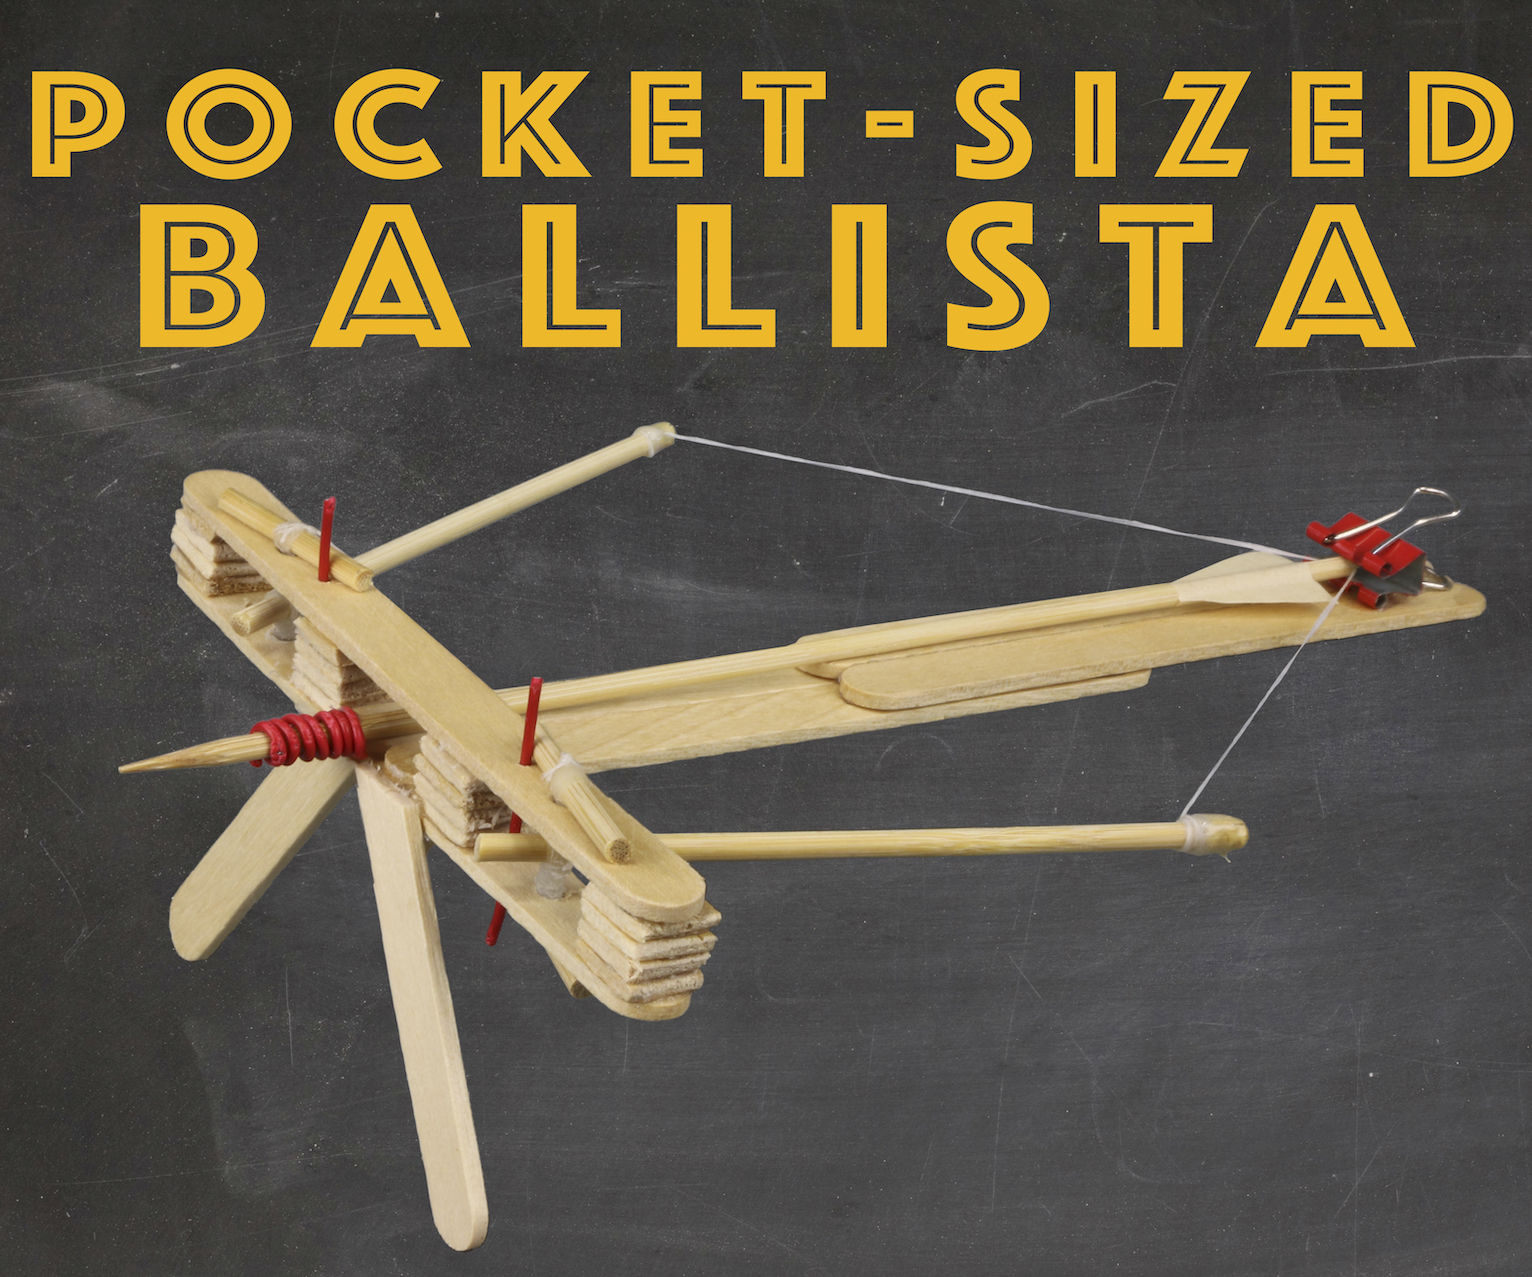 Pocket-Sized Ballista